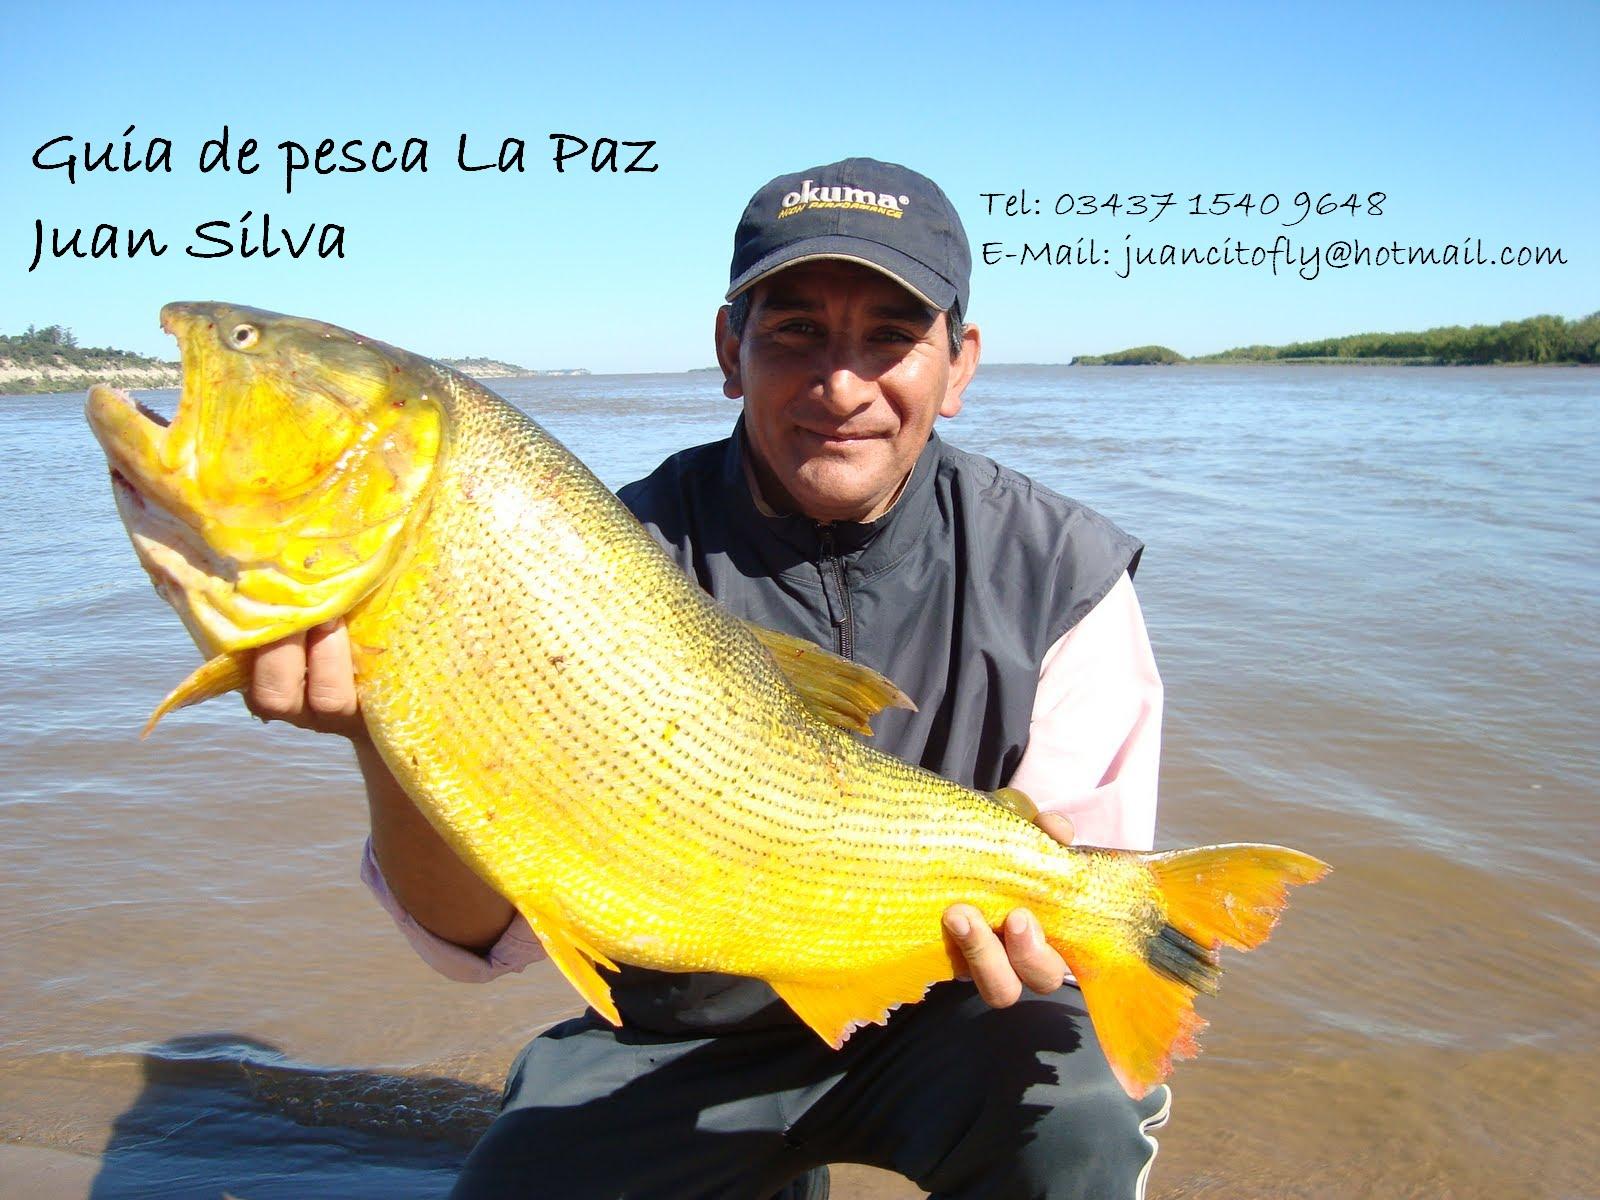 Guia de Pesca La Paz